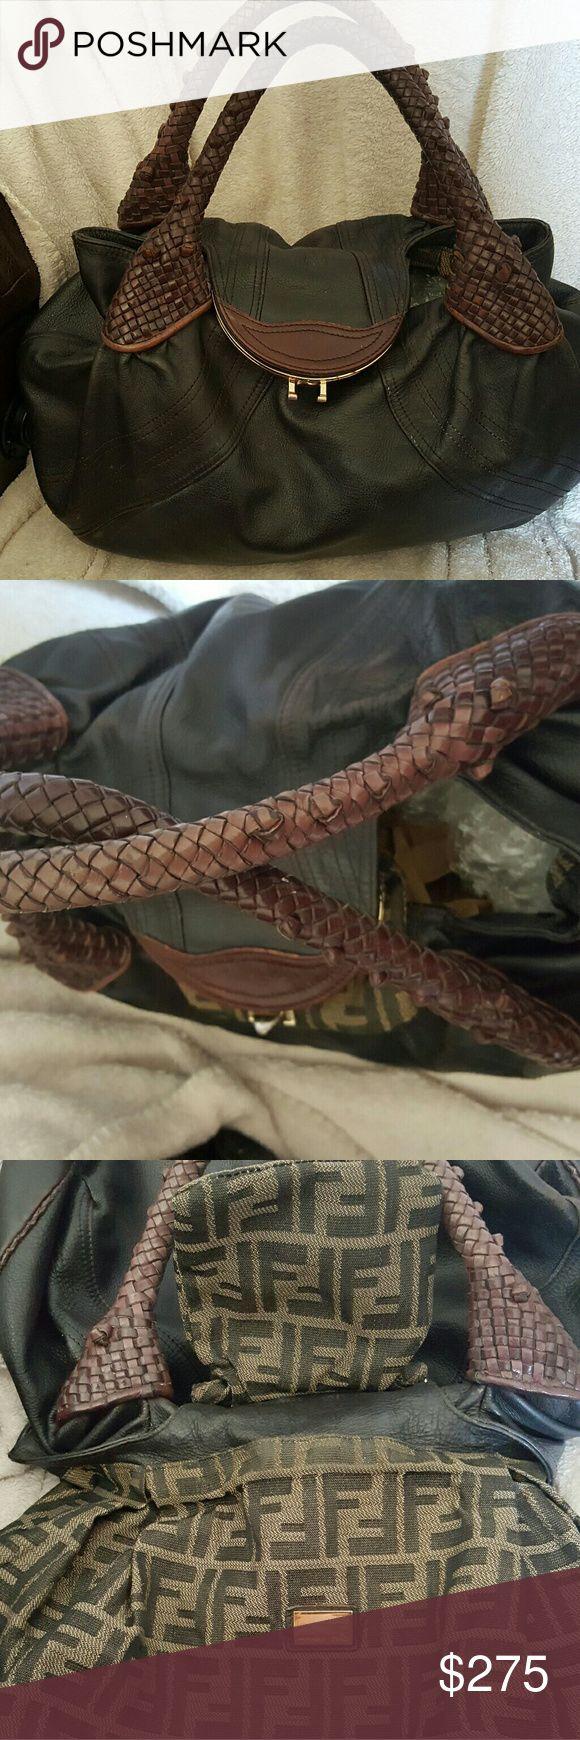 Flash sale!!!! 100% Authentic Fendi Spy Bag See photo for details.... Fendi Bags Hobos